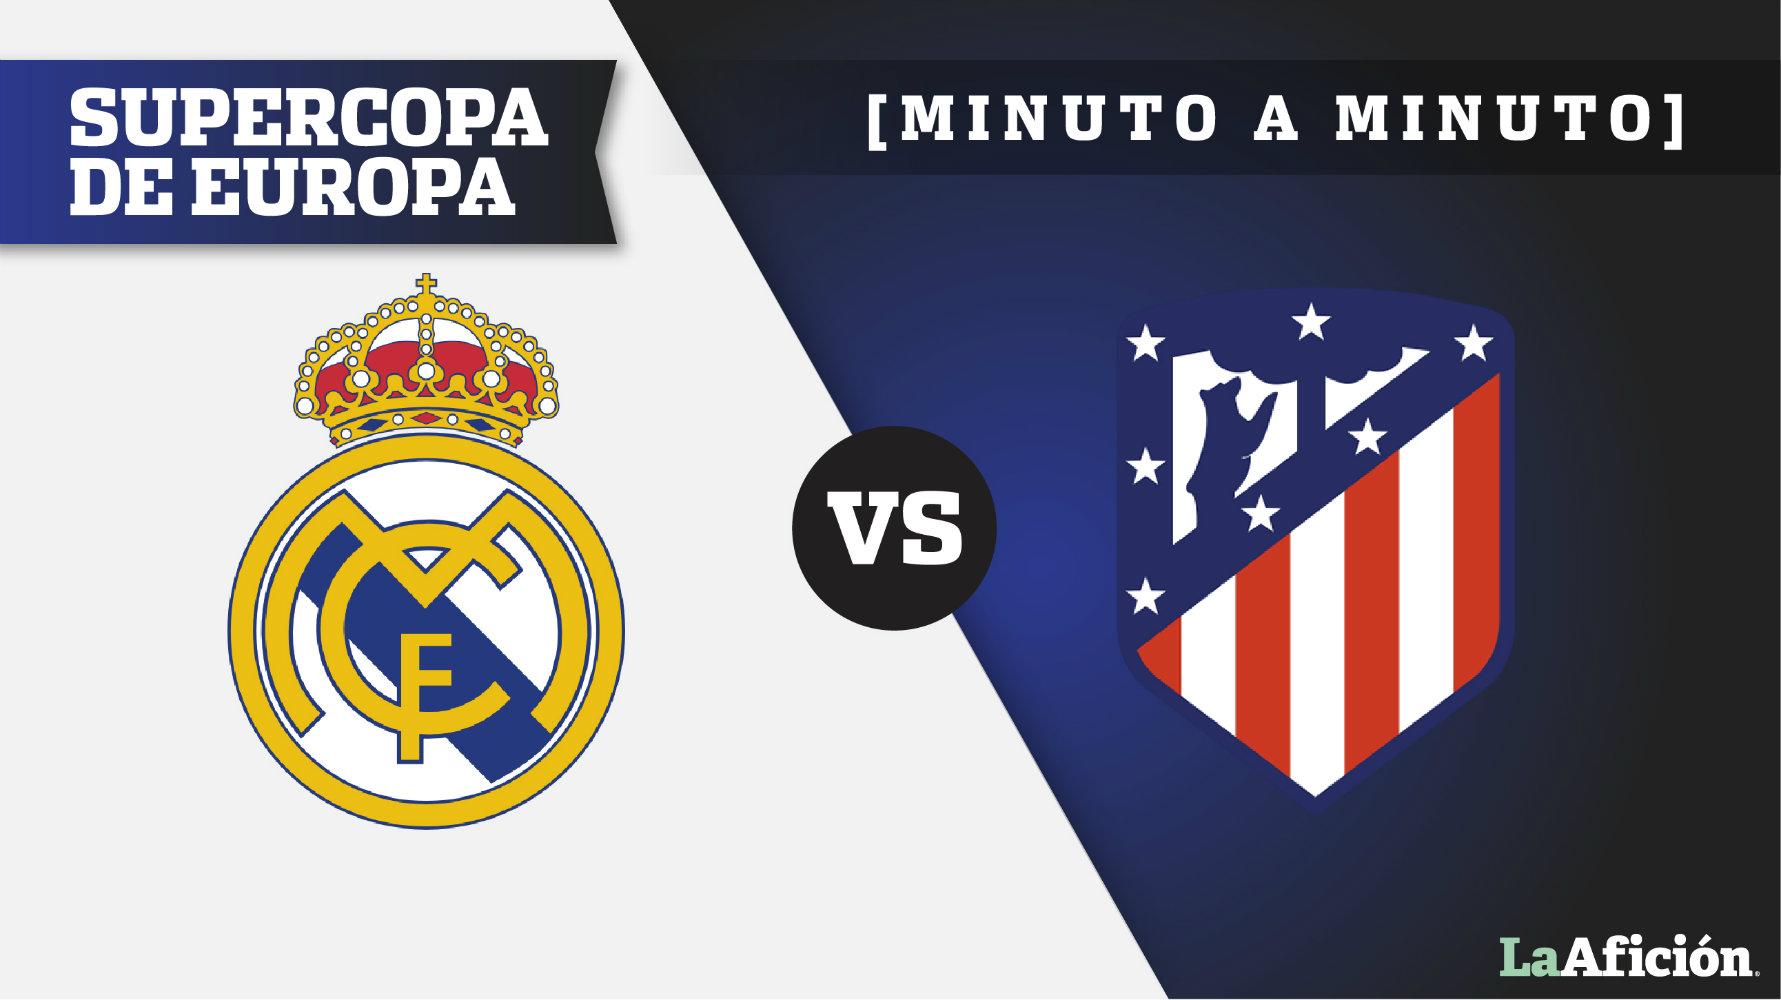 Real Madrid 2-4 Atlético de Madrid, Supercopa de Europa: GOLES